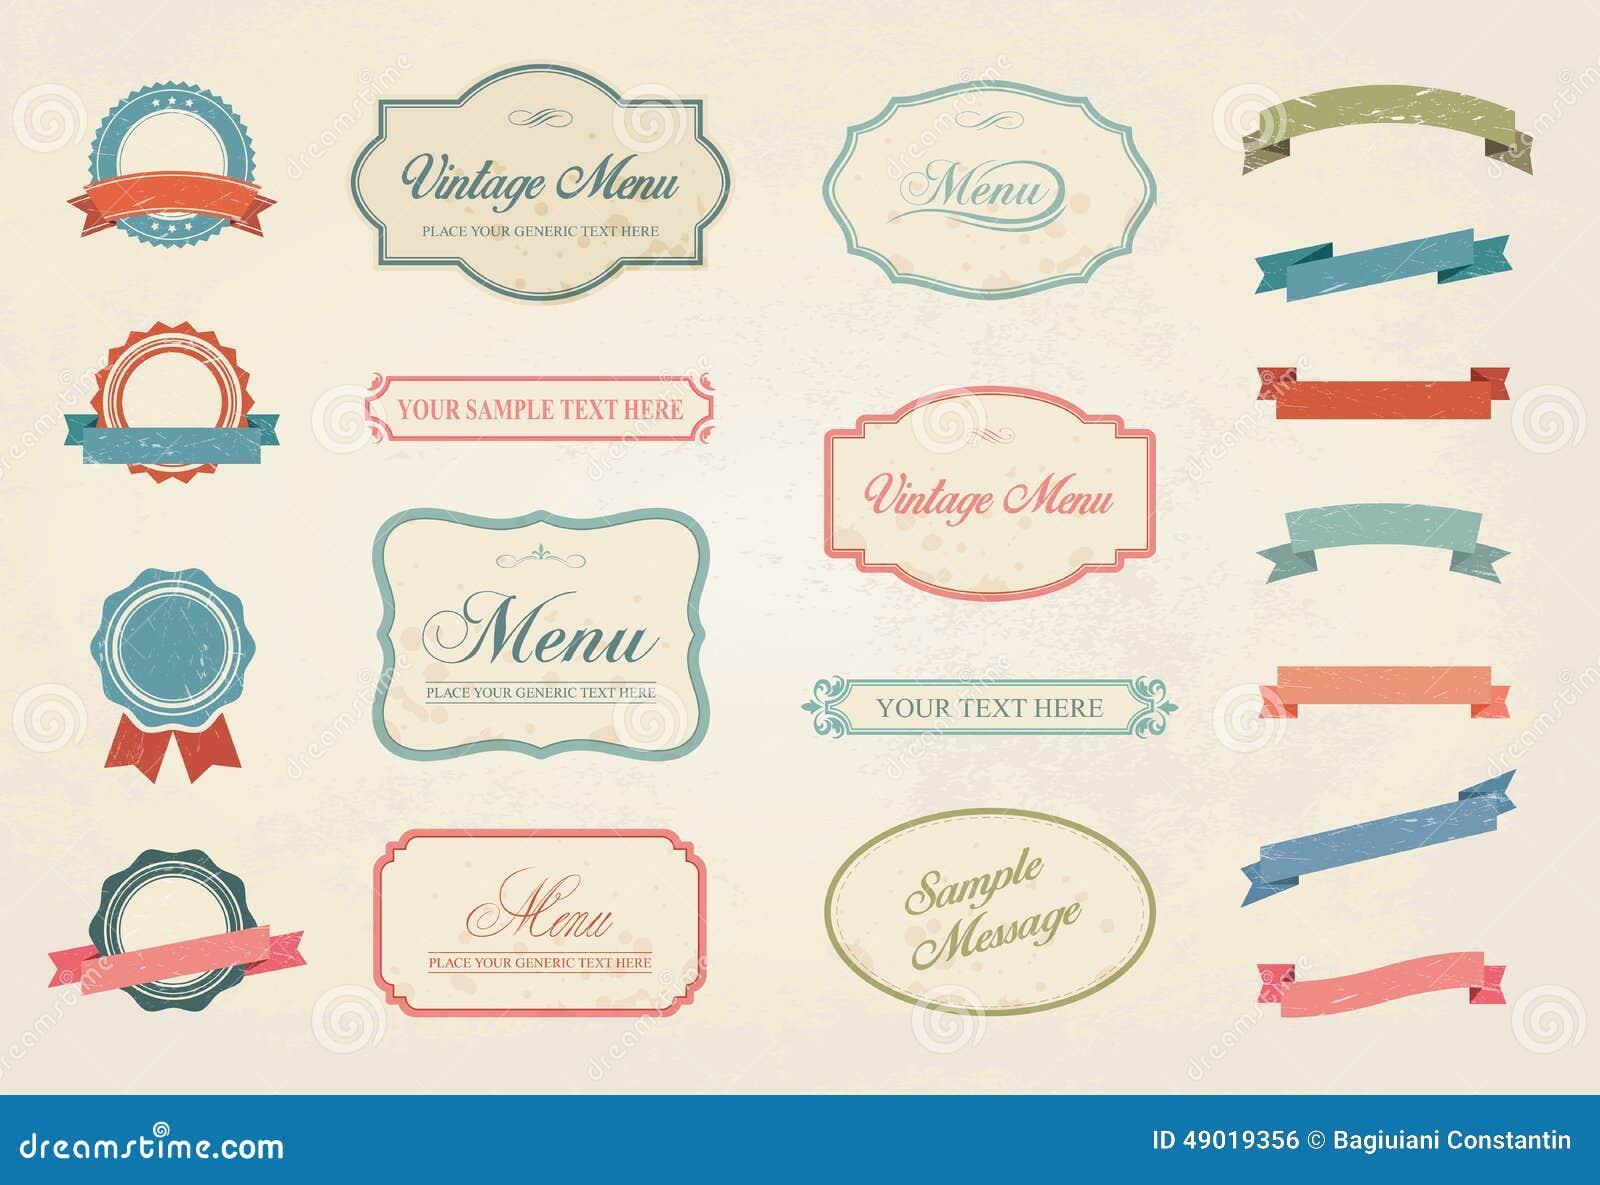 Vintage Labels Vector Design Elements Collection Set